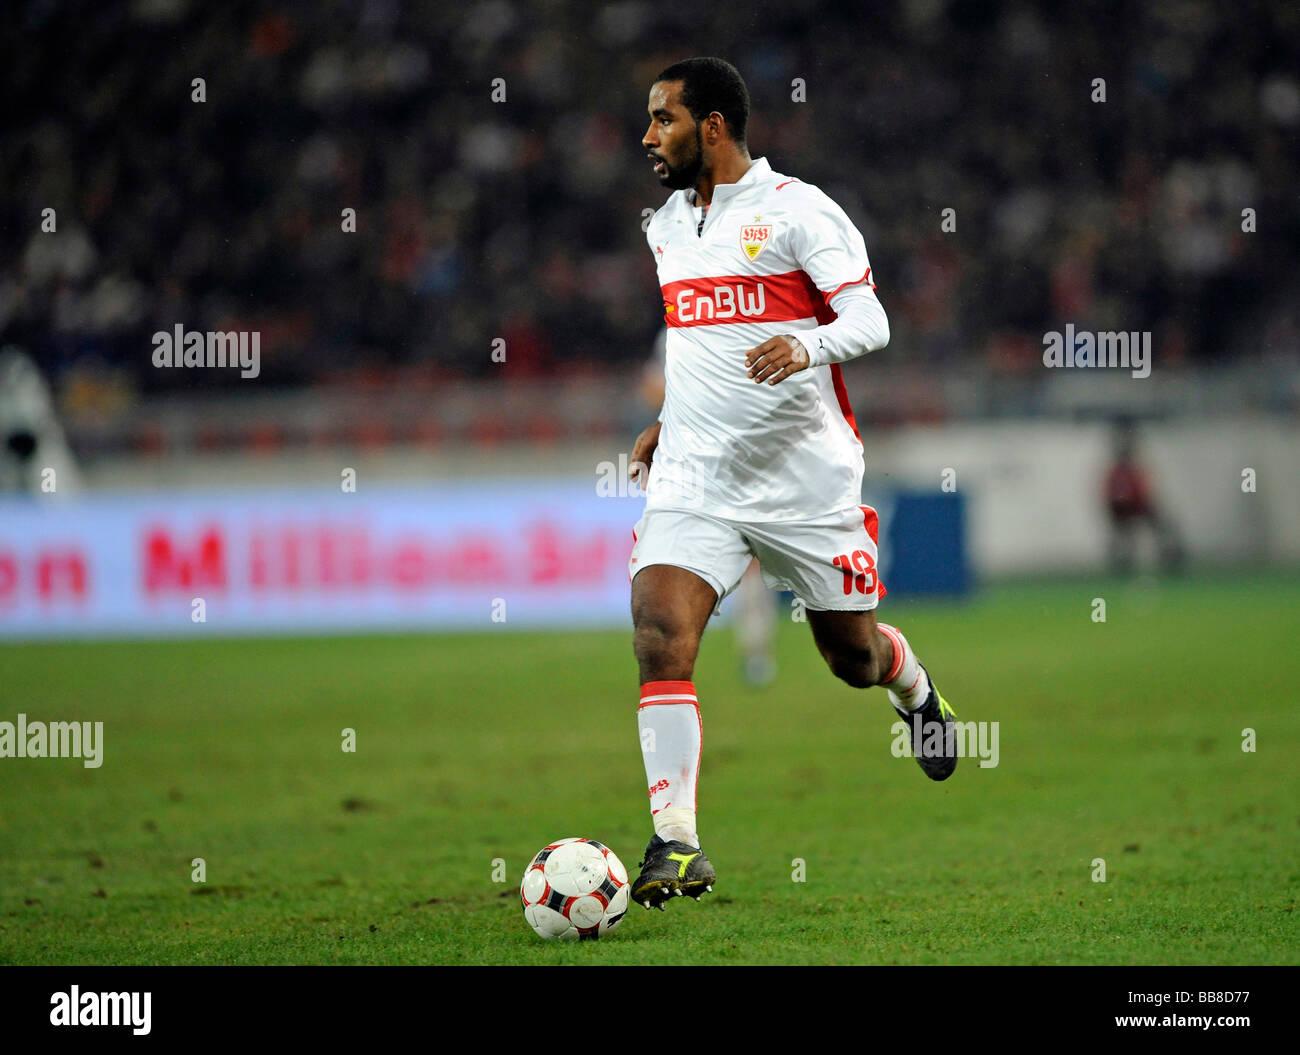 CACAU, VfB Stuttgart, with the ball - Stock Image